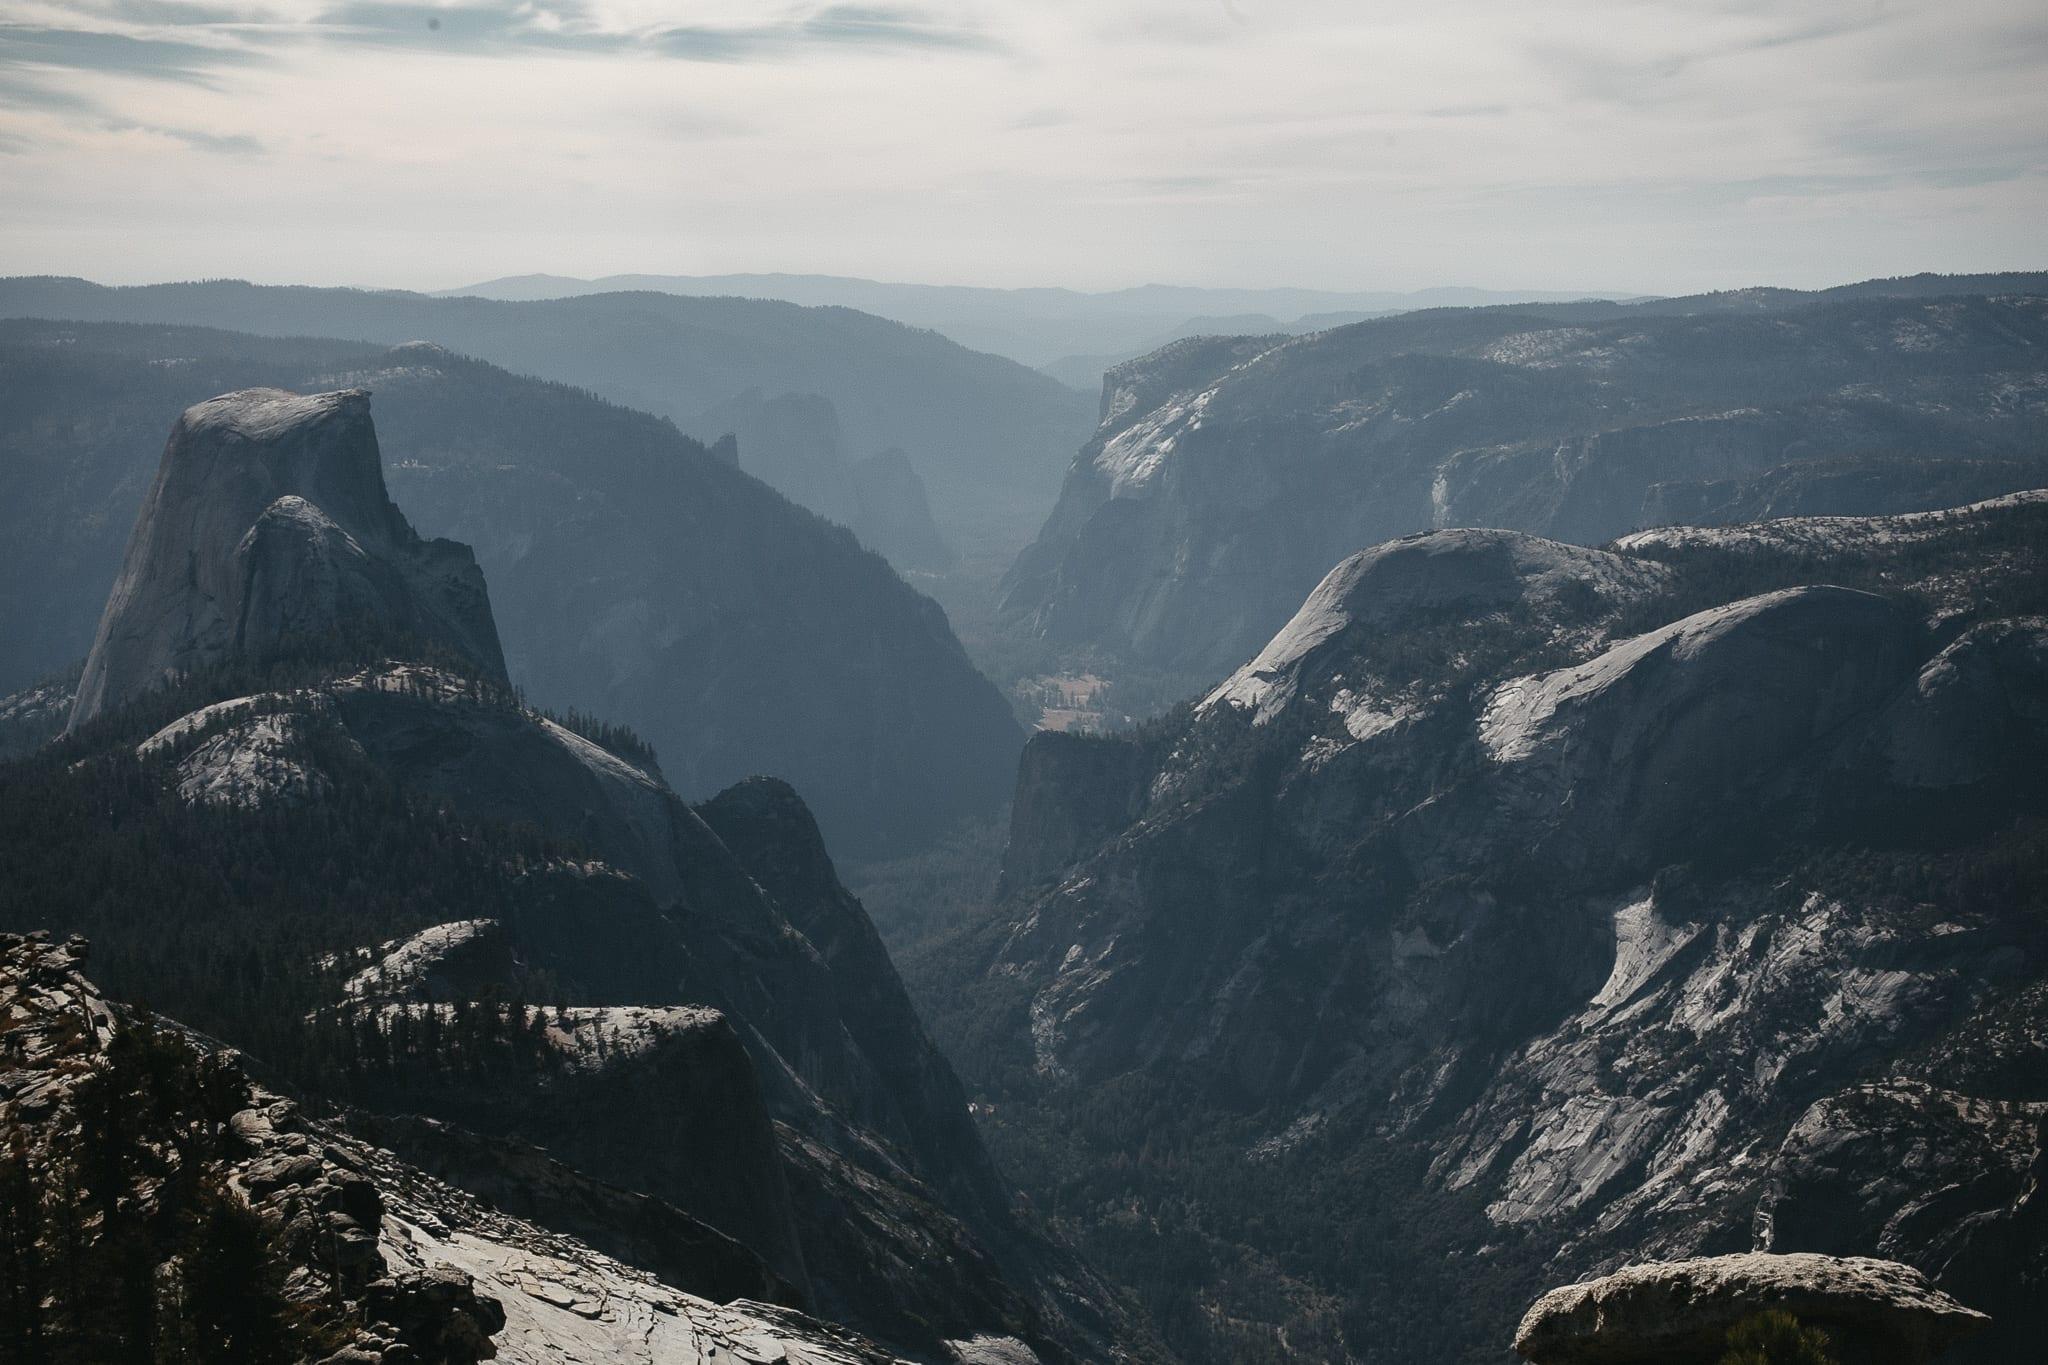 clouds-rest-yosemite-california-engagement-lifestyle-adventure-photographer-12